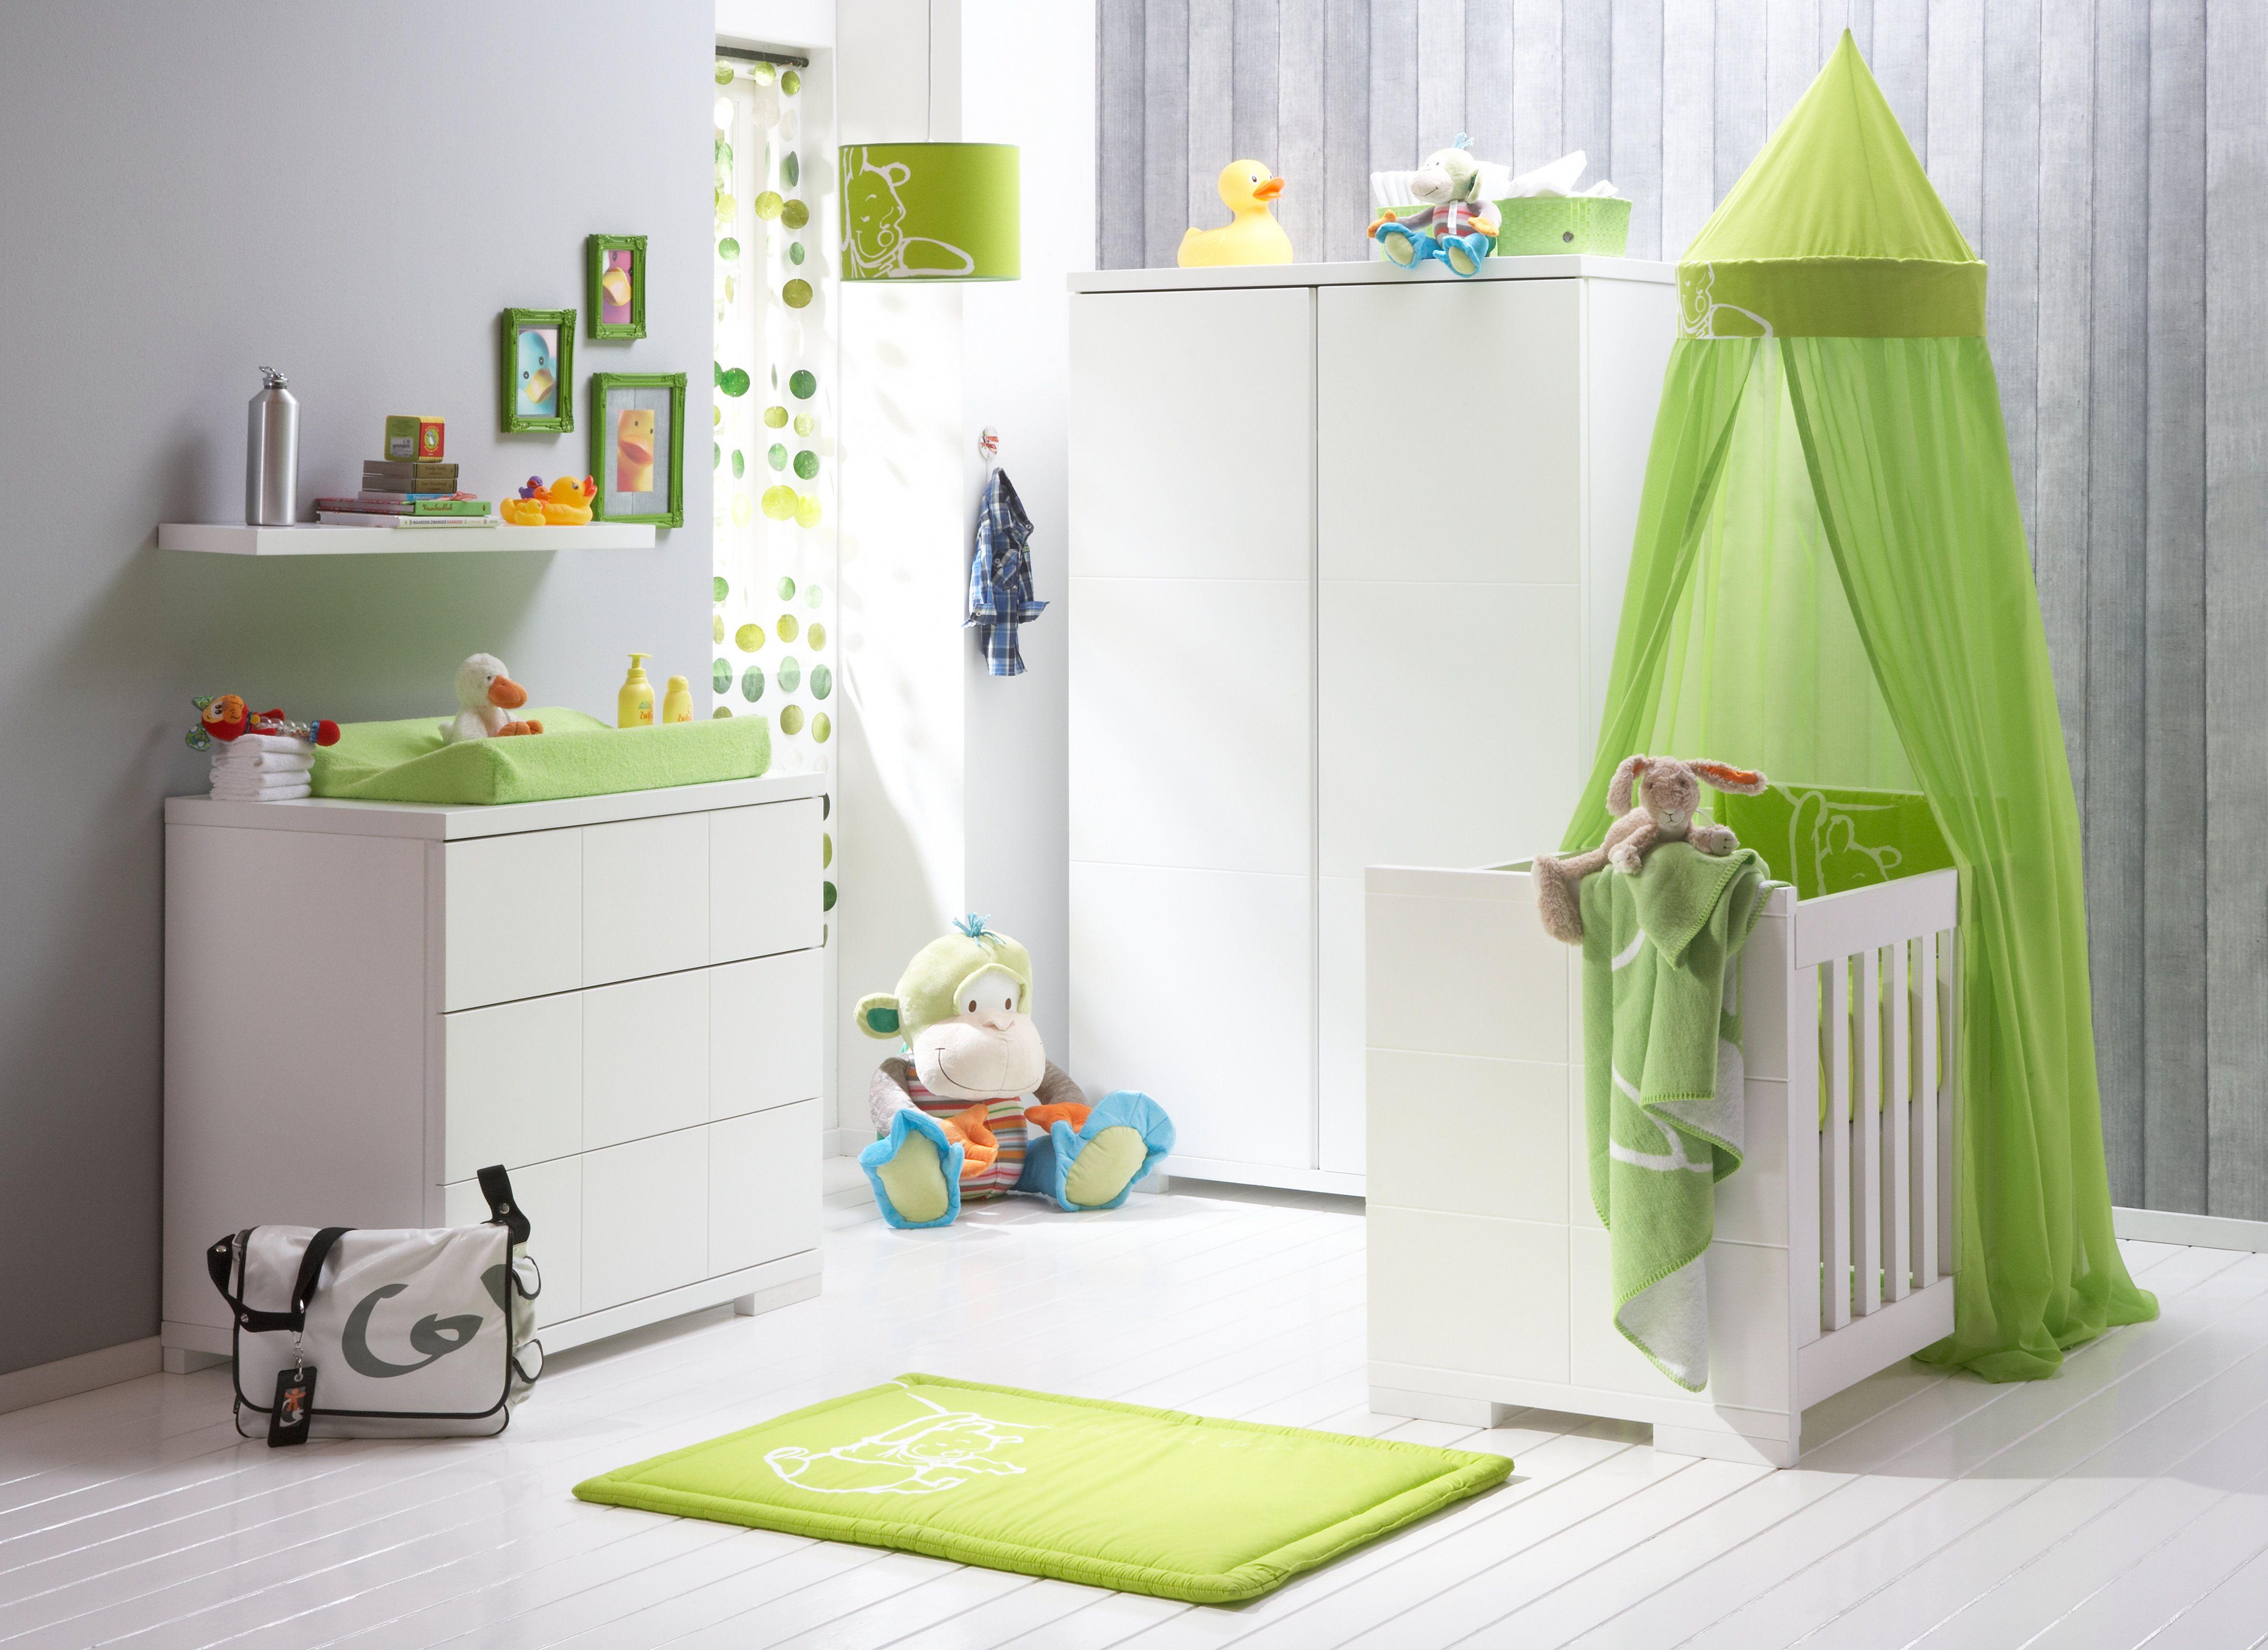 Twf Babykamer Denver.Twf Europe Mobiliario Infantil Babyroom Babykamer Conjunto